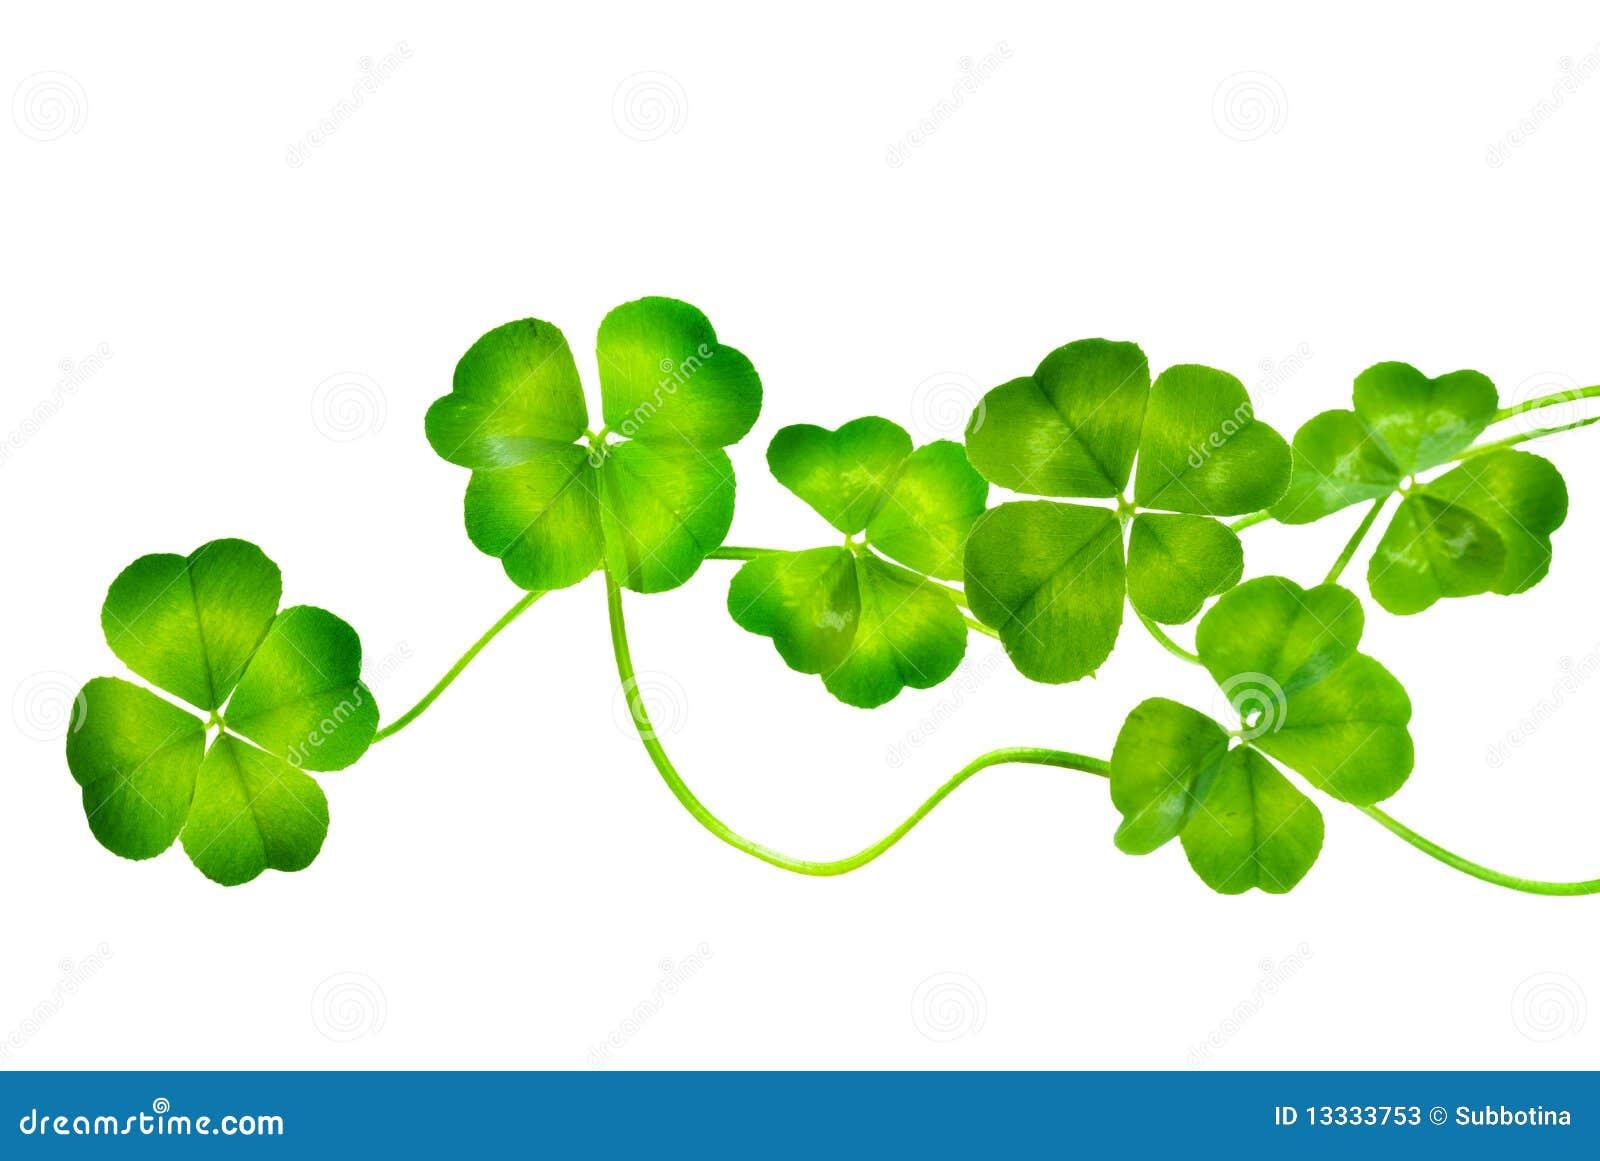 St.Patricks Day Shamrock Stock Photos - Image: 13333753